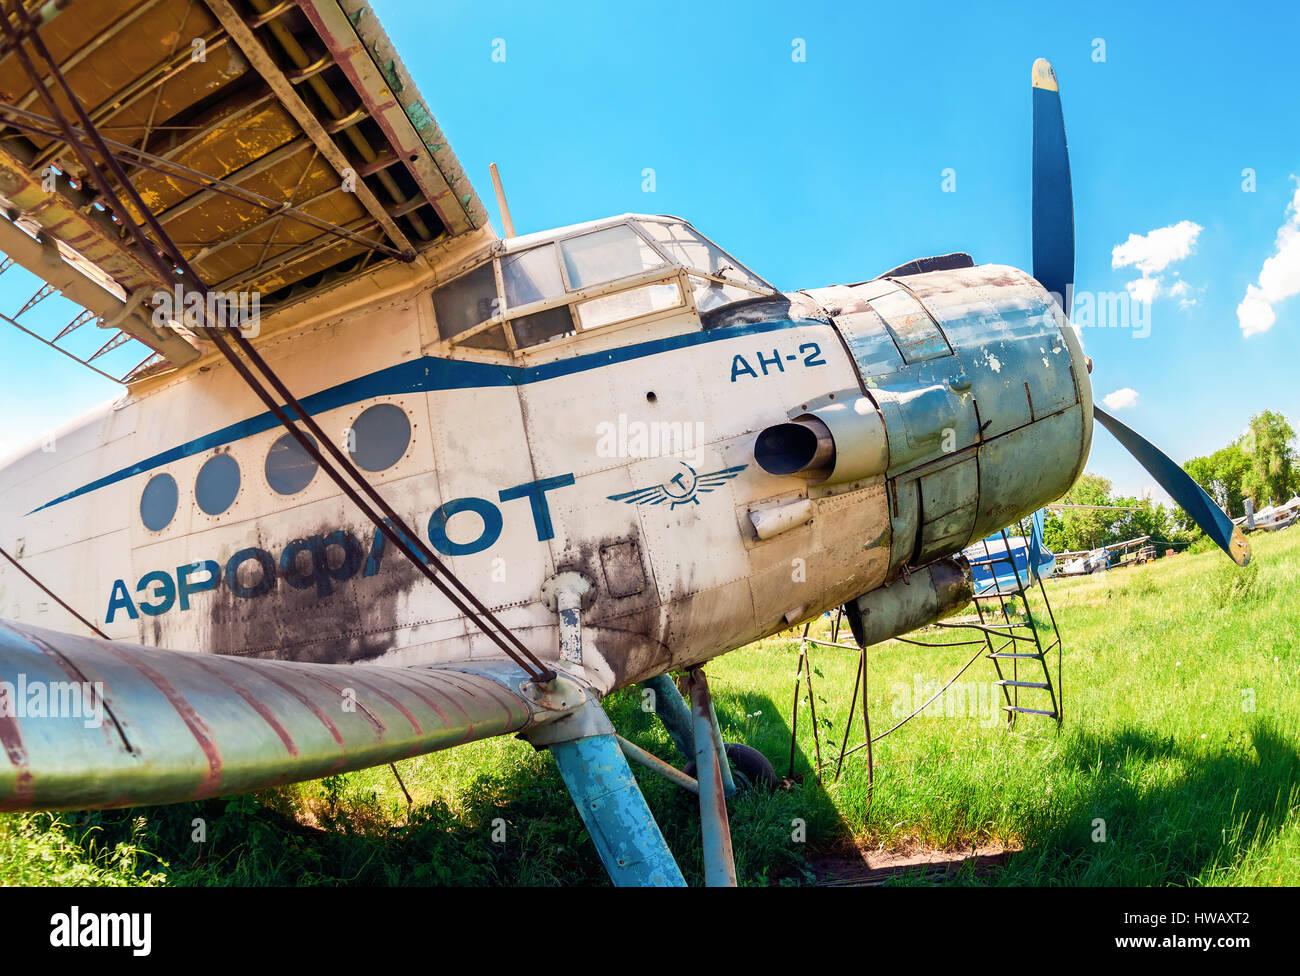 SAMARA, RUSSIA - MAY 25, 2014: Old russian aircraft An-2 at an abandoned aerodrome in summertime. The Antonov An - Stock Image